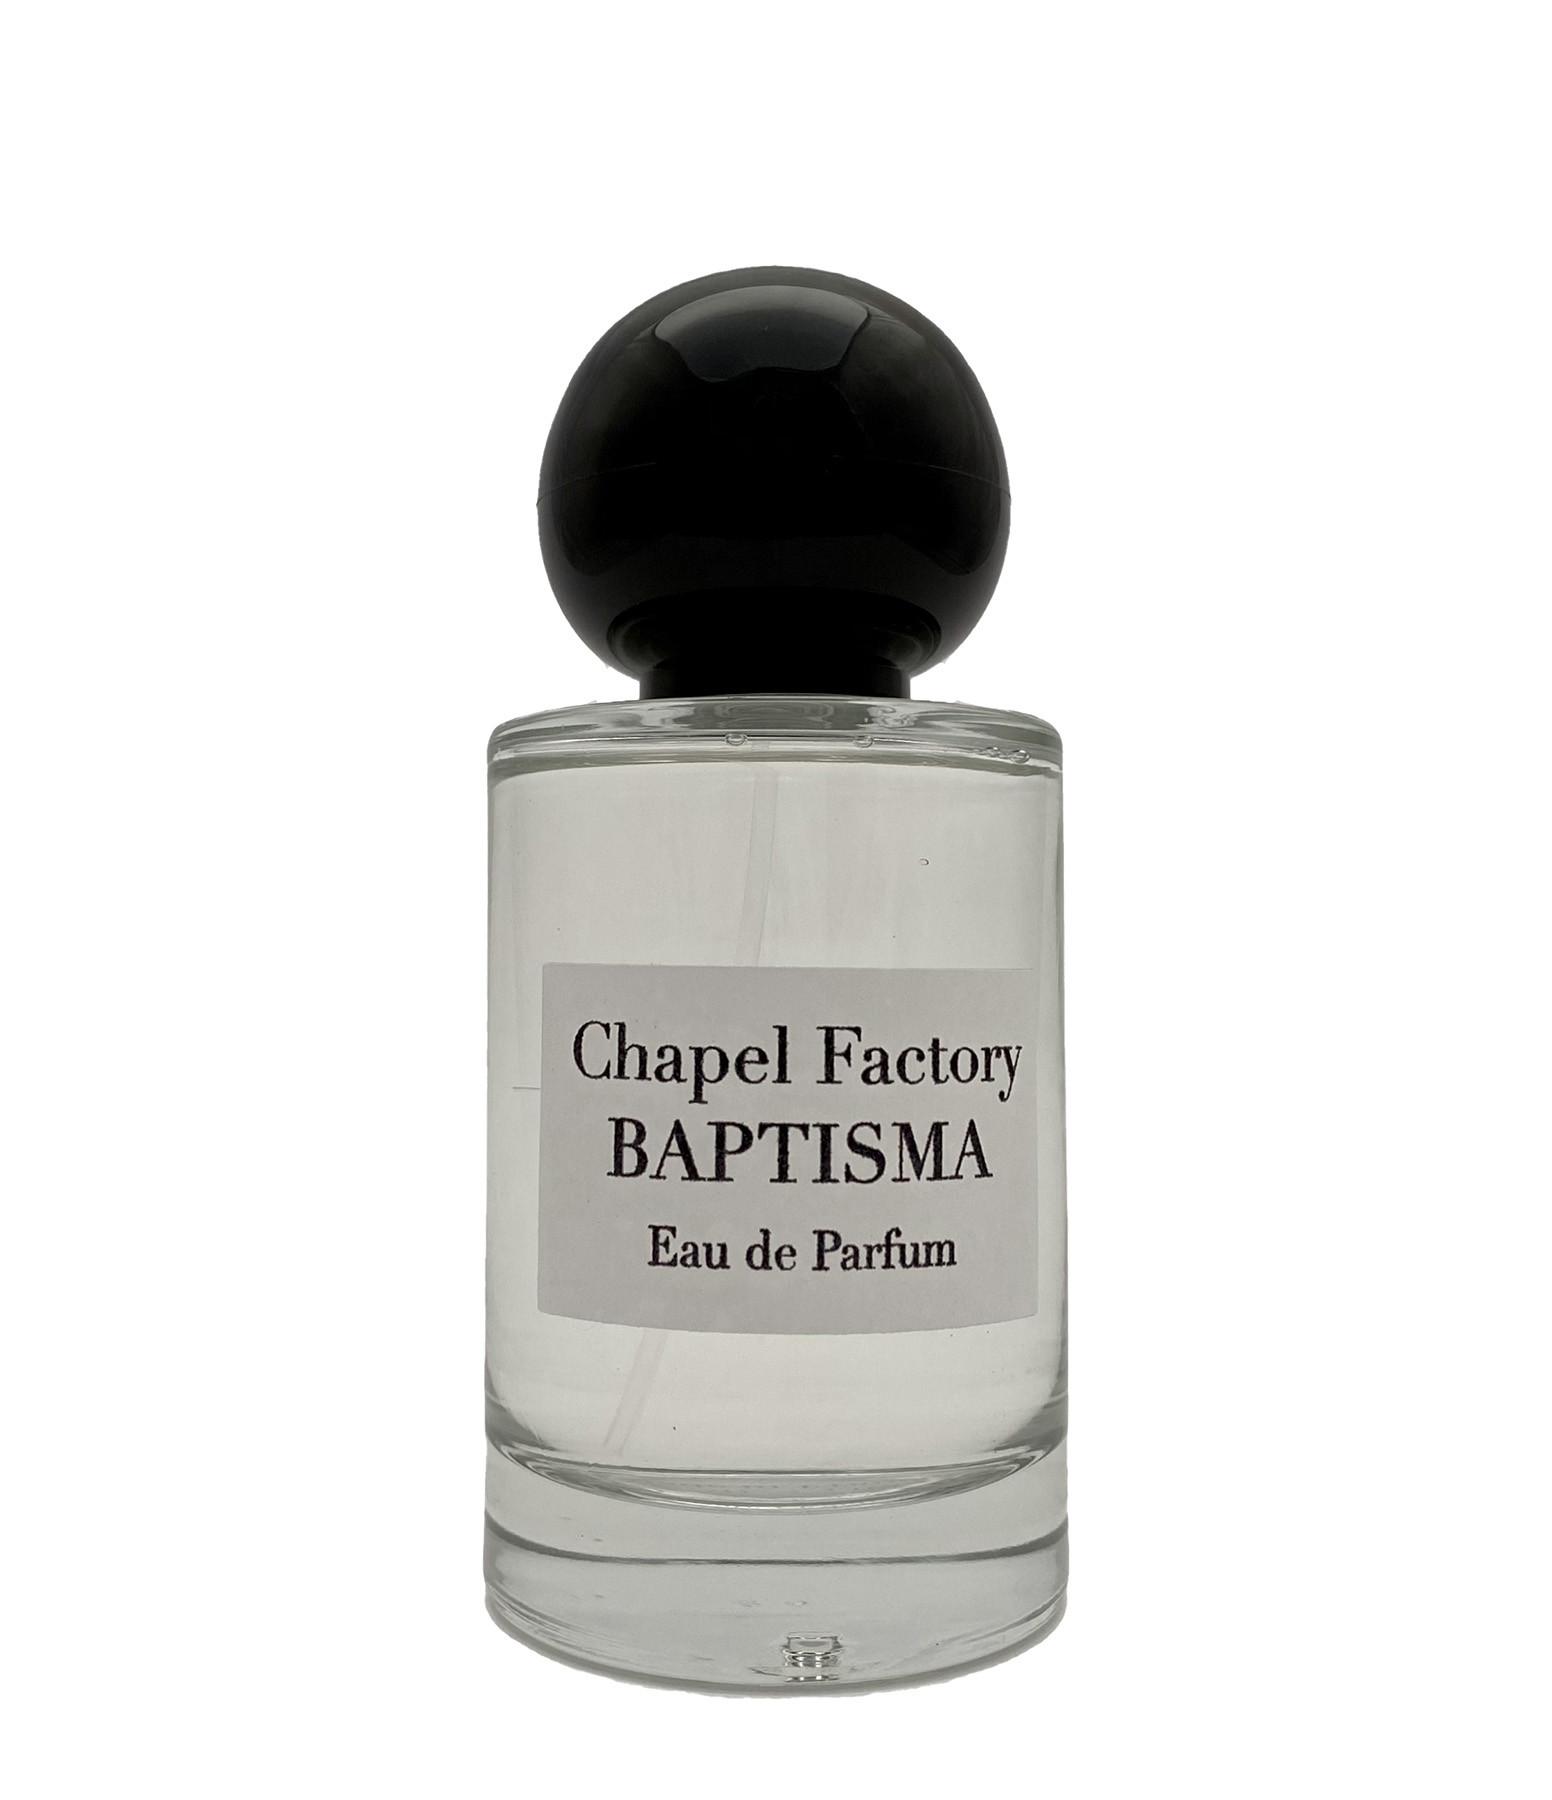 CHAPEL FACTORY - Eau de Parfum Baptisma 100ml